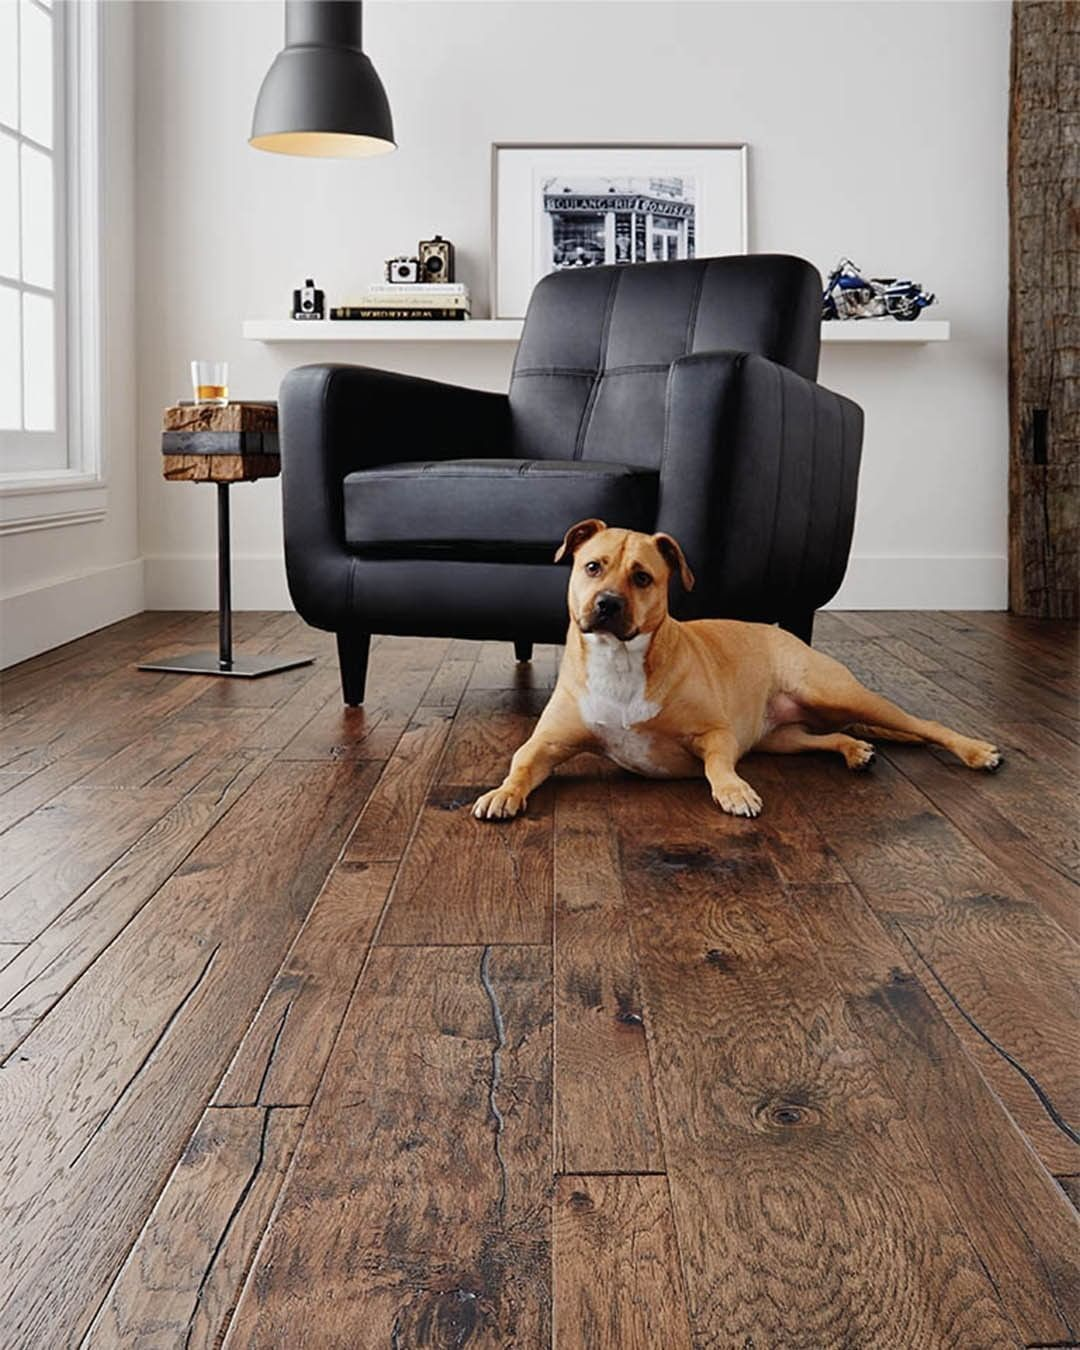 Distressed Wood Flooring Rekindles The Warming Character Of Timber That Has Been Lovingly Worn By Thousands Of Feet Wood Floors Distressed Wood Floors Flooring